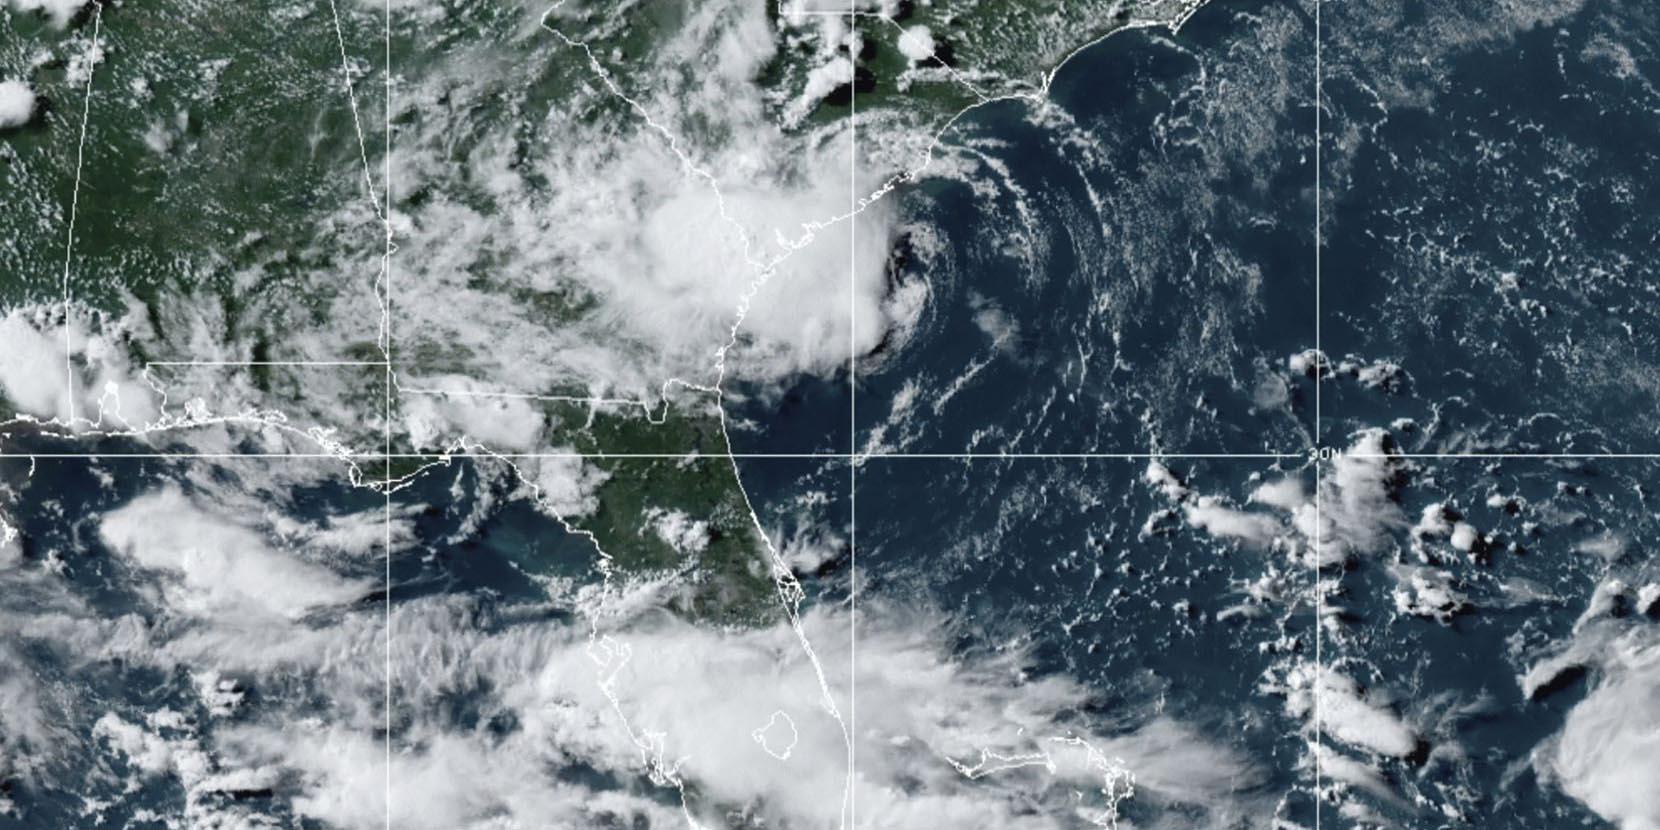 Tormenta tropical 'Elsa' azota y lastima a República Dominicana y Haití   El Imparcial de Oaxaca